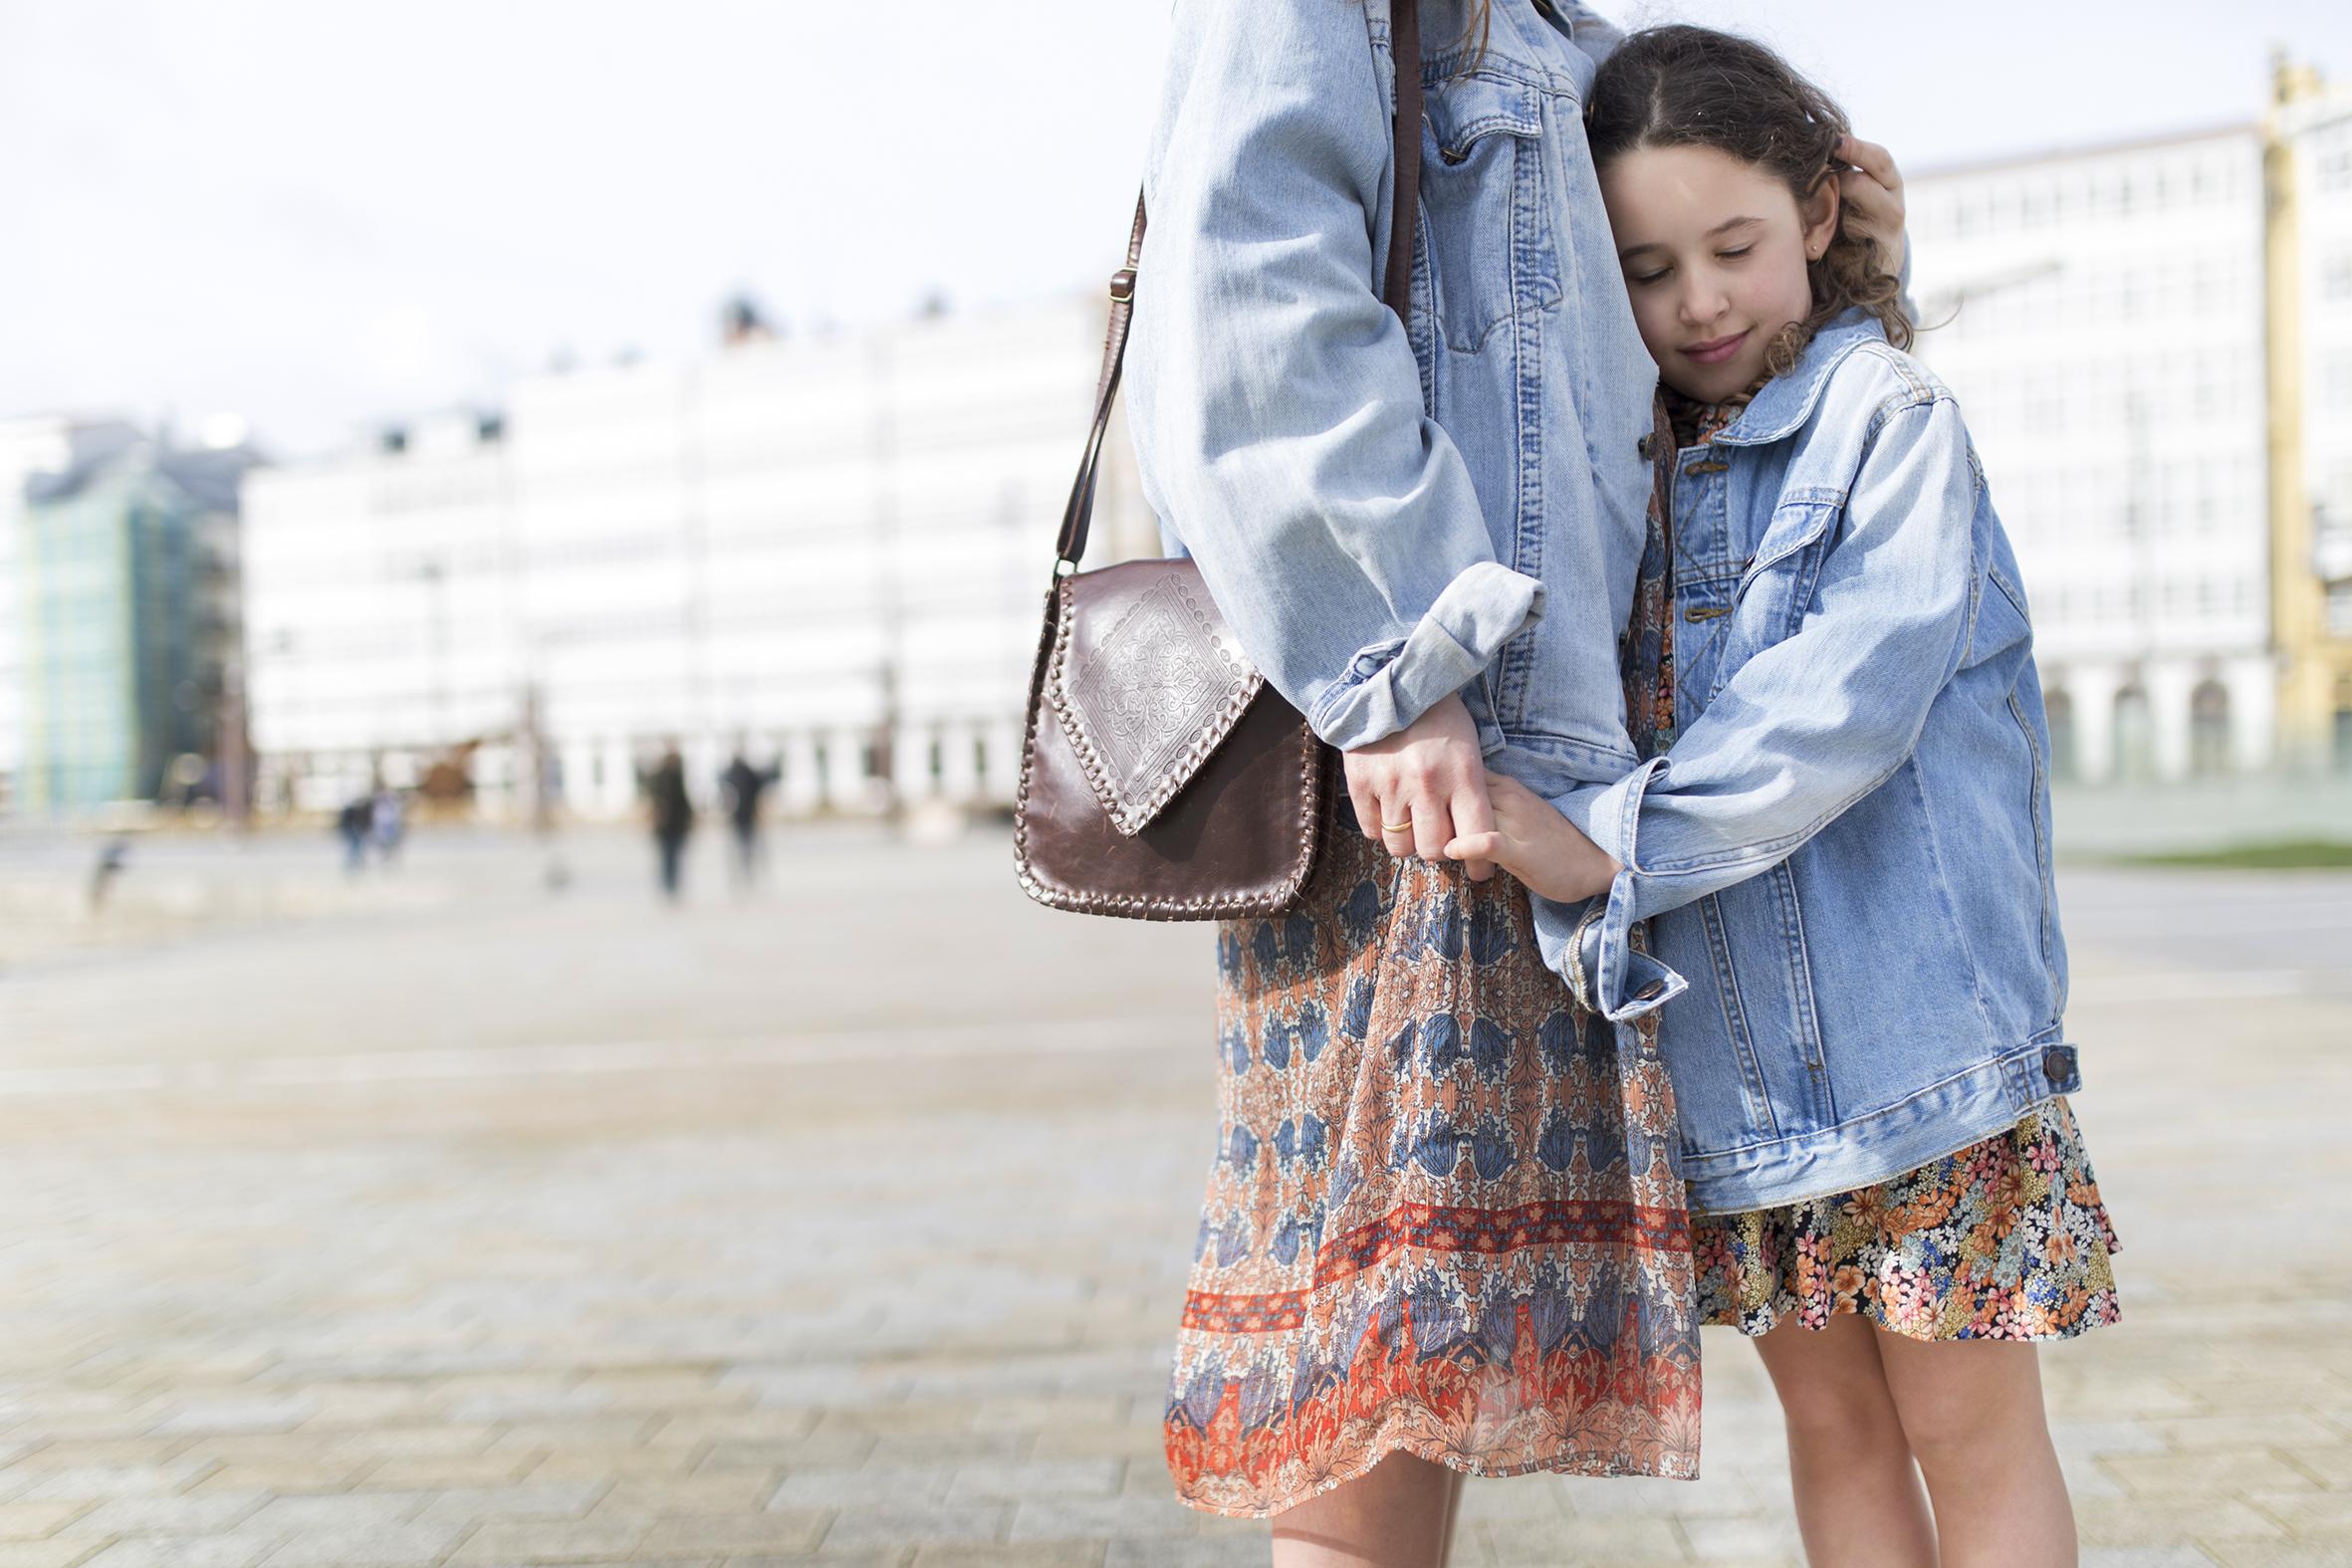 My partner-mi hija-Urban Outfitters- madre e hija- fashion-moda-street style-jimena&me-mother daughter-promod-zara kids-denim jacket